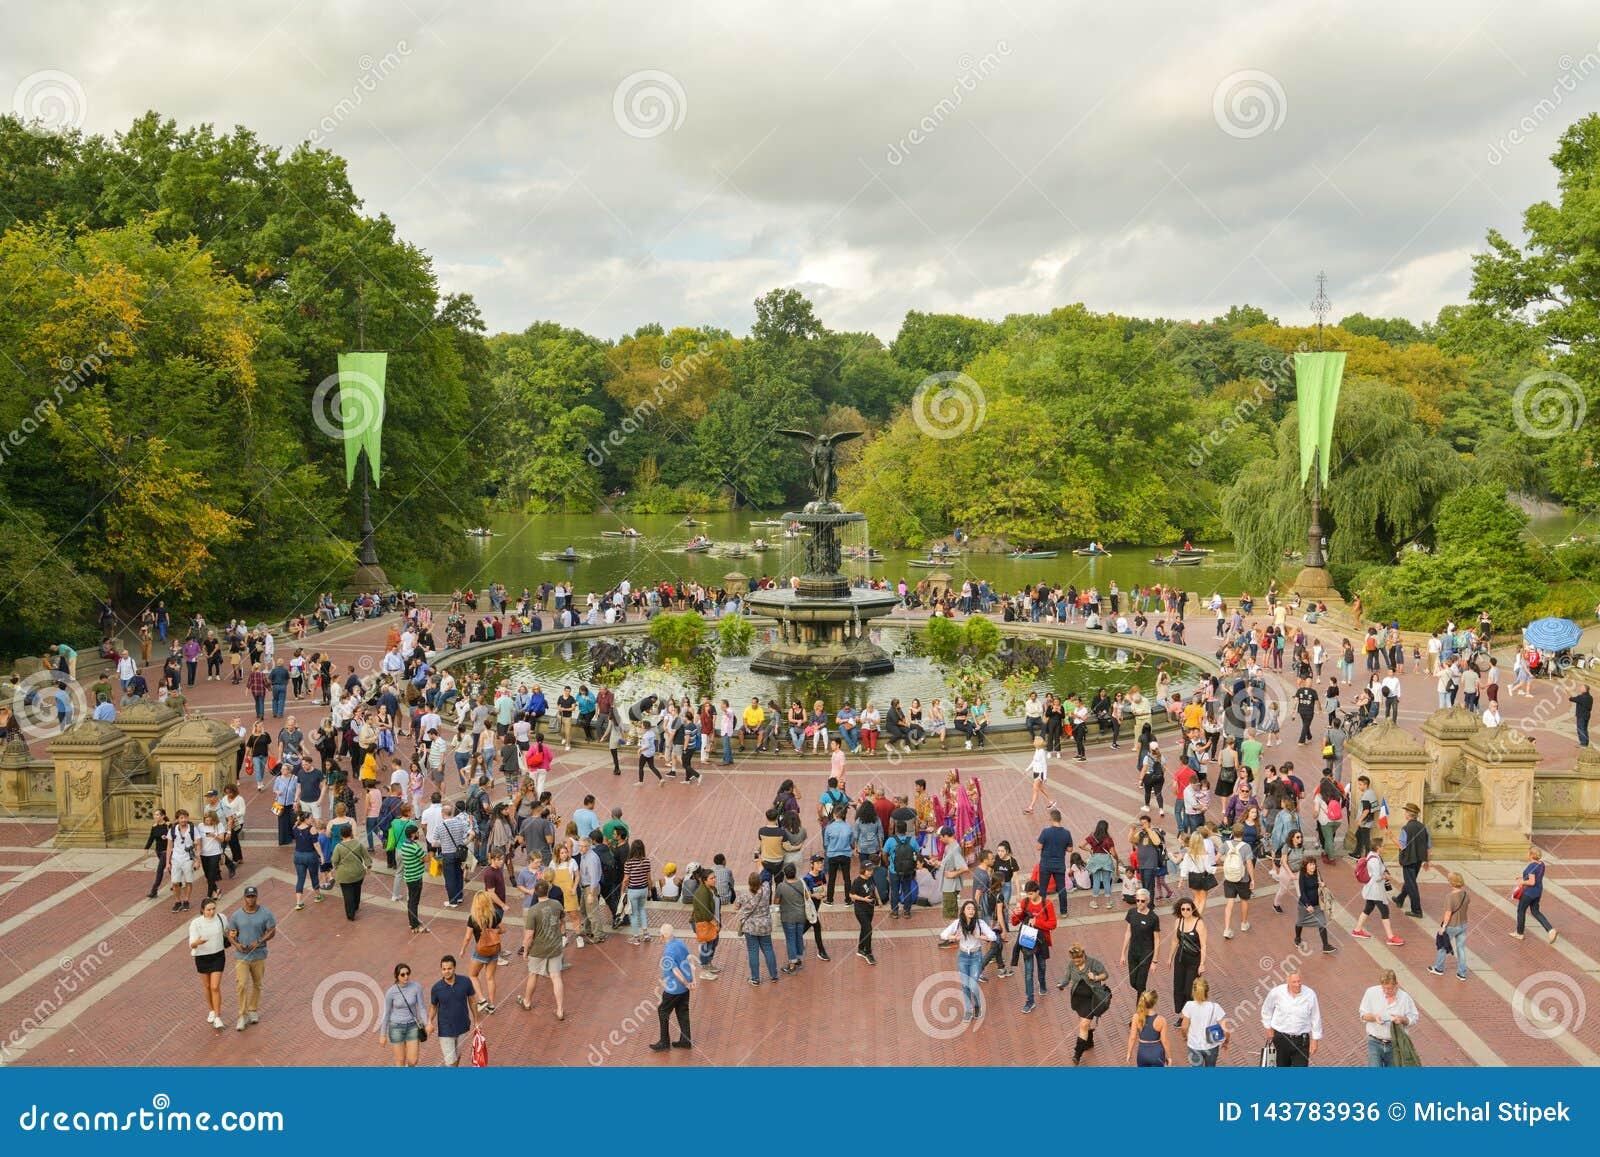 Överbefolkade Bethesda Terrace i Central Park, New York City